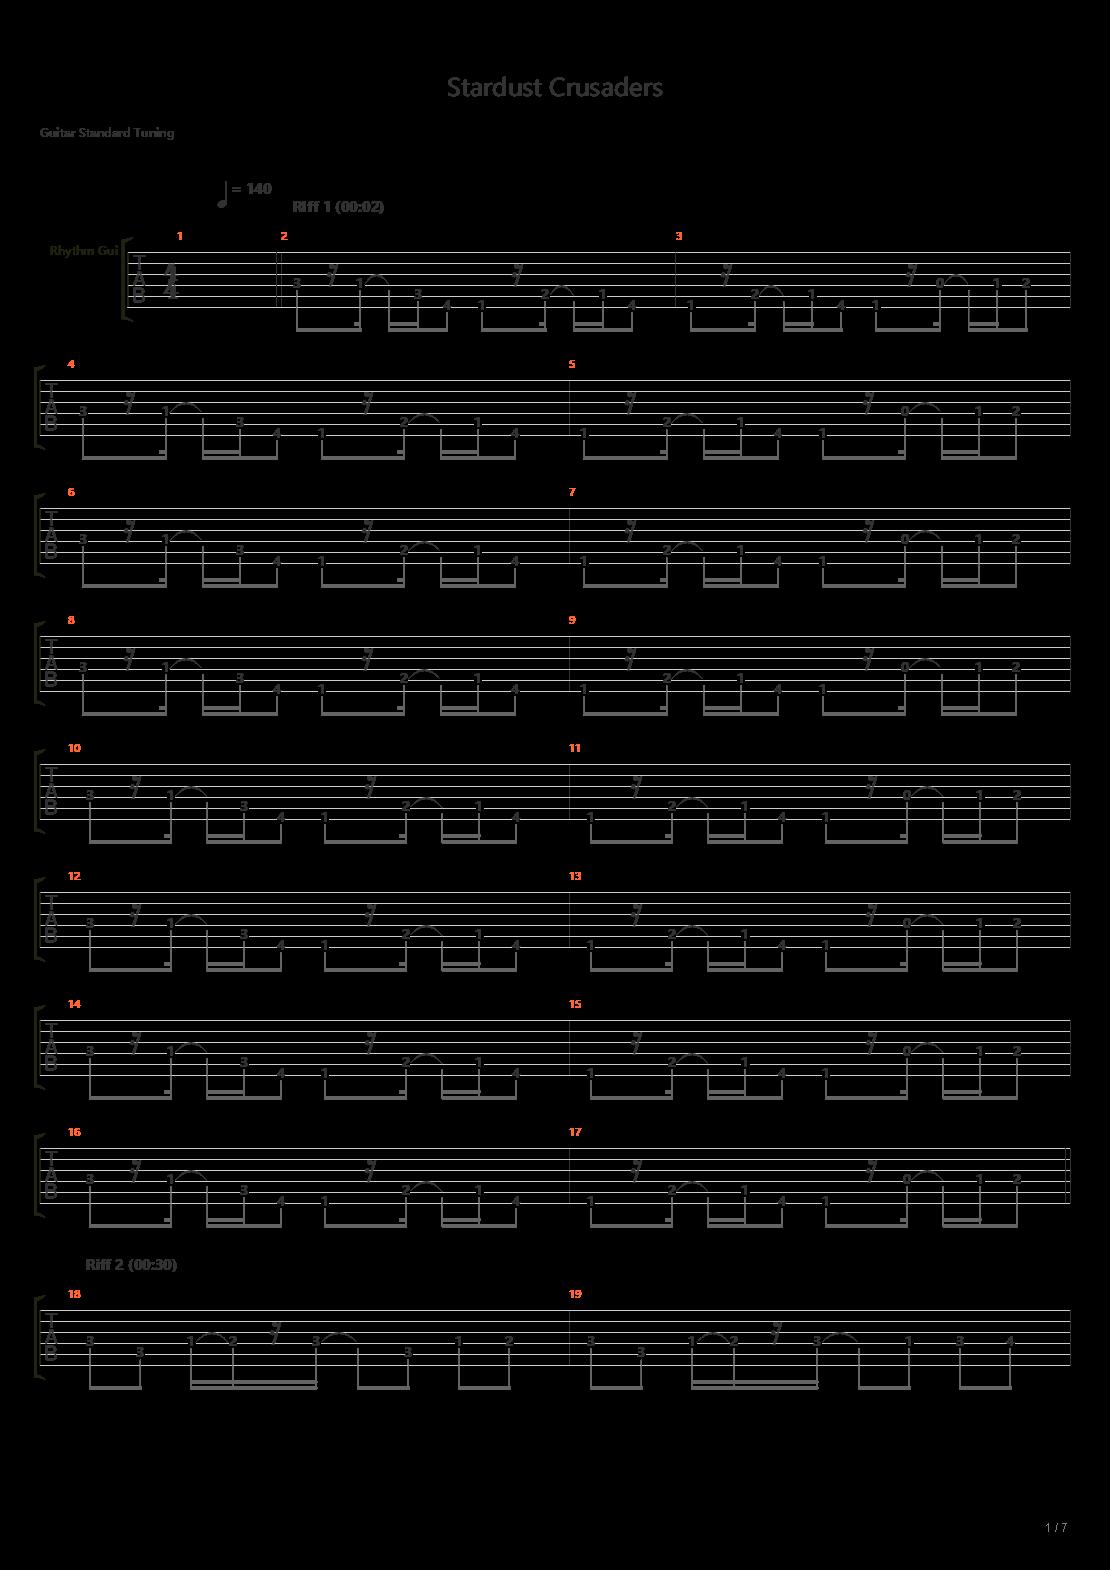 JOJO 白金之星处刑曲  (星尘斗士) 空调承太郎 スターダストクルセイダース吉他谱